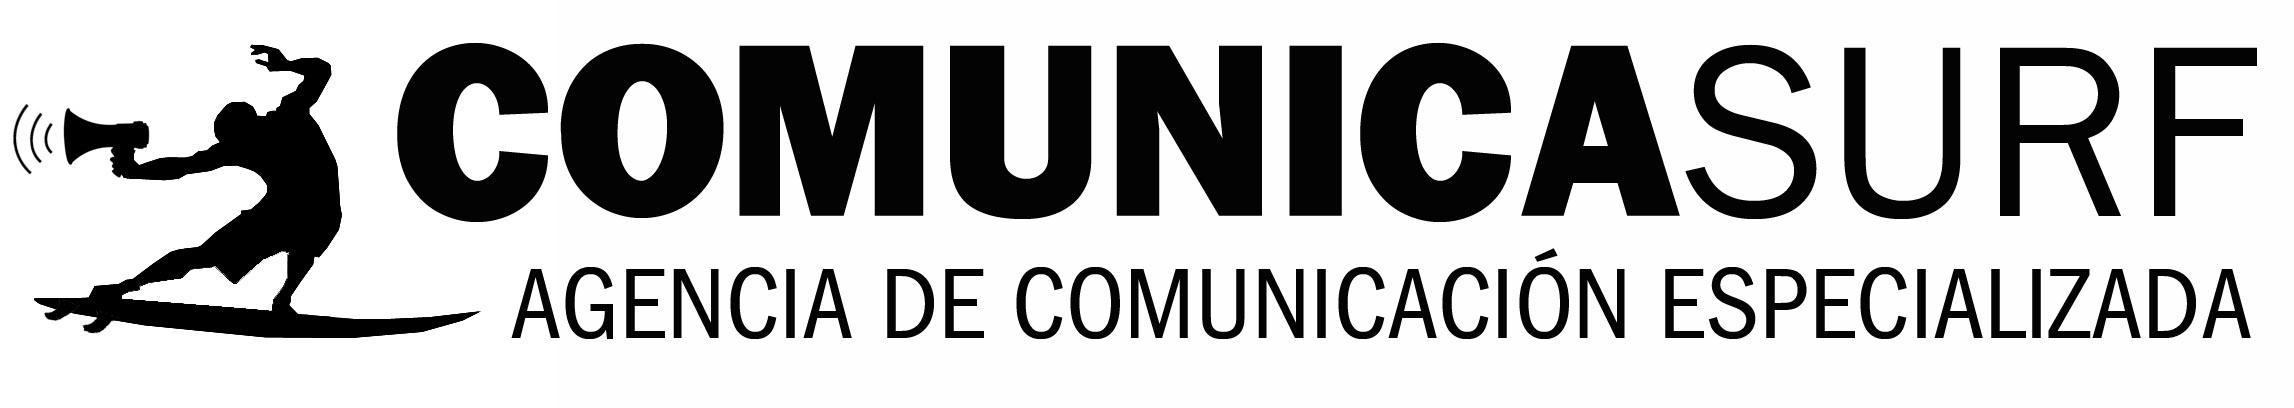 comunicasurf_logo.jpg